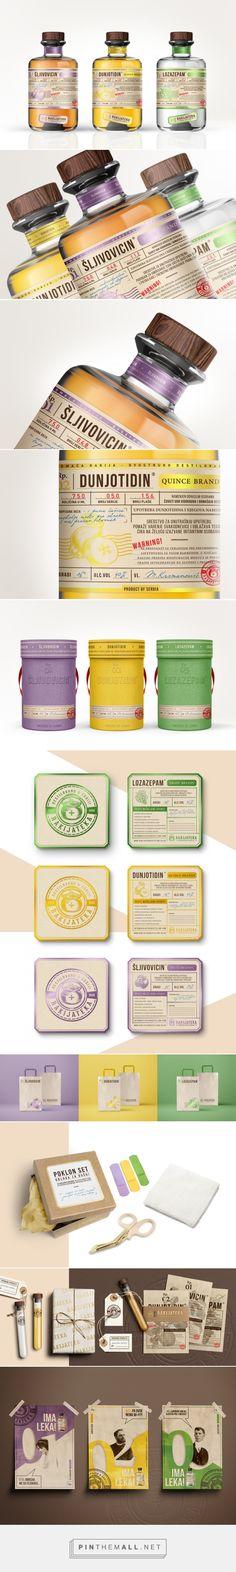 Rakijateka Distilling Company packaging design by Jovana Randjelovic (Serbia) - http://www.packagingoftheworld.com/2016/09/rakijateka-distilling-company-student.html